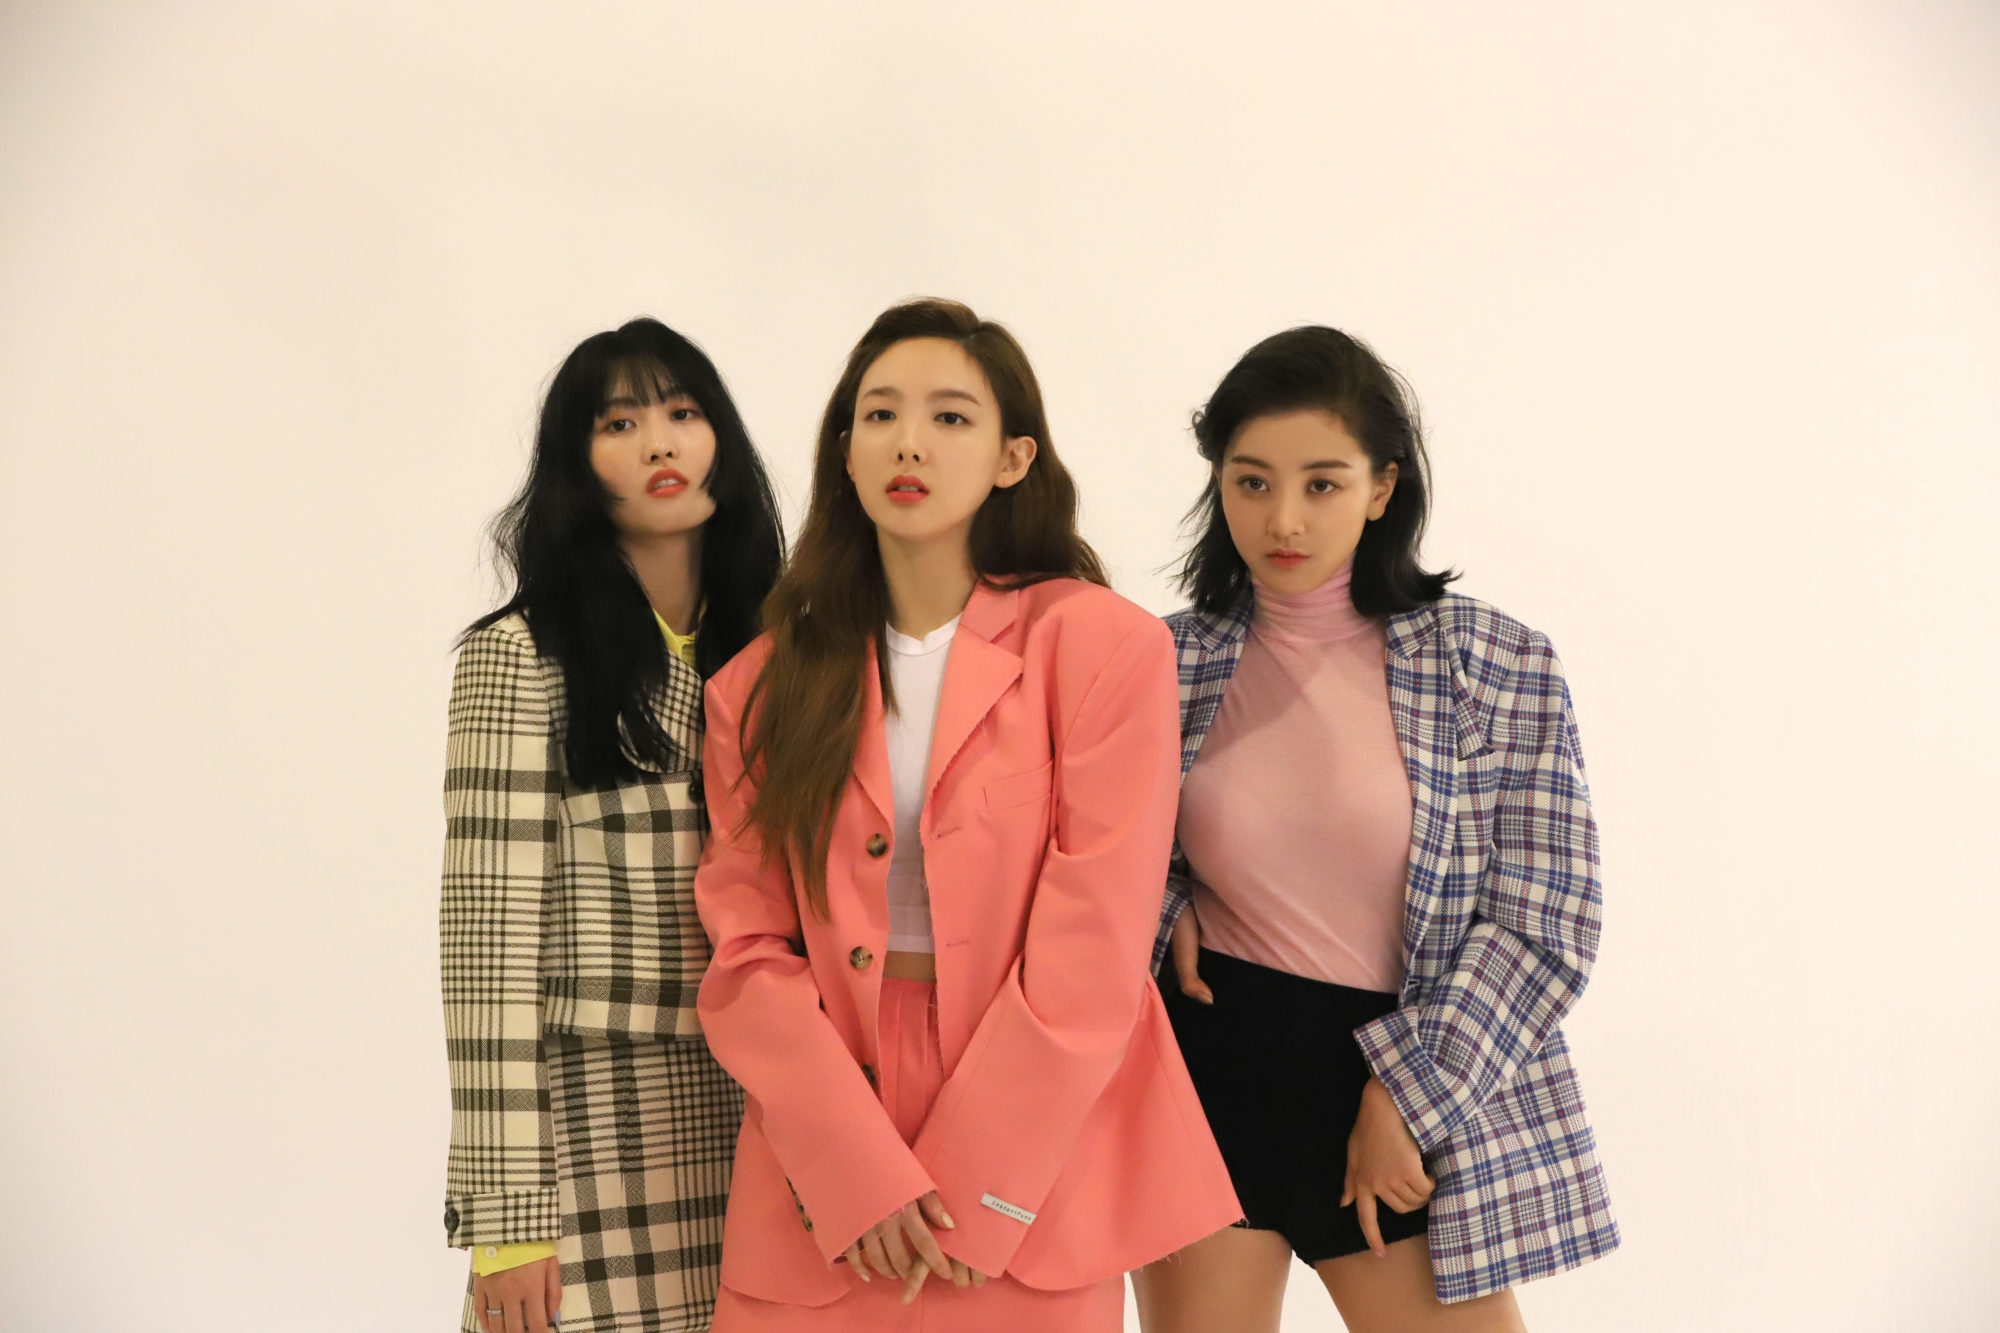 Twice Allure Momo Nayeon Jihyo 2019 HD